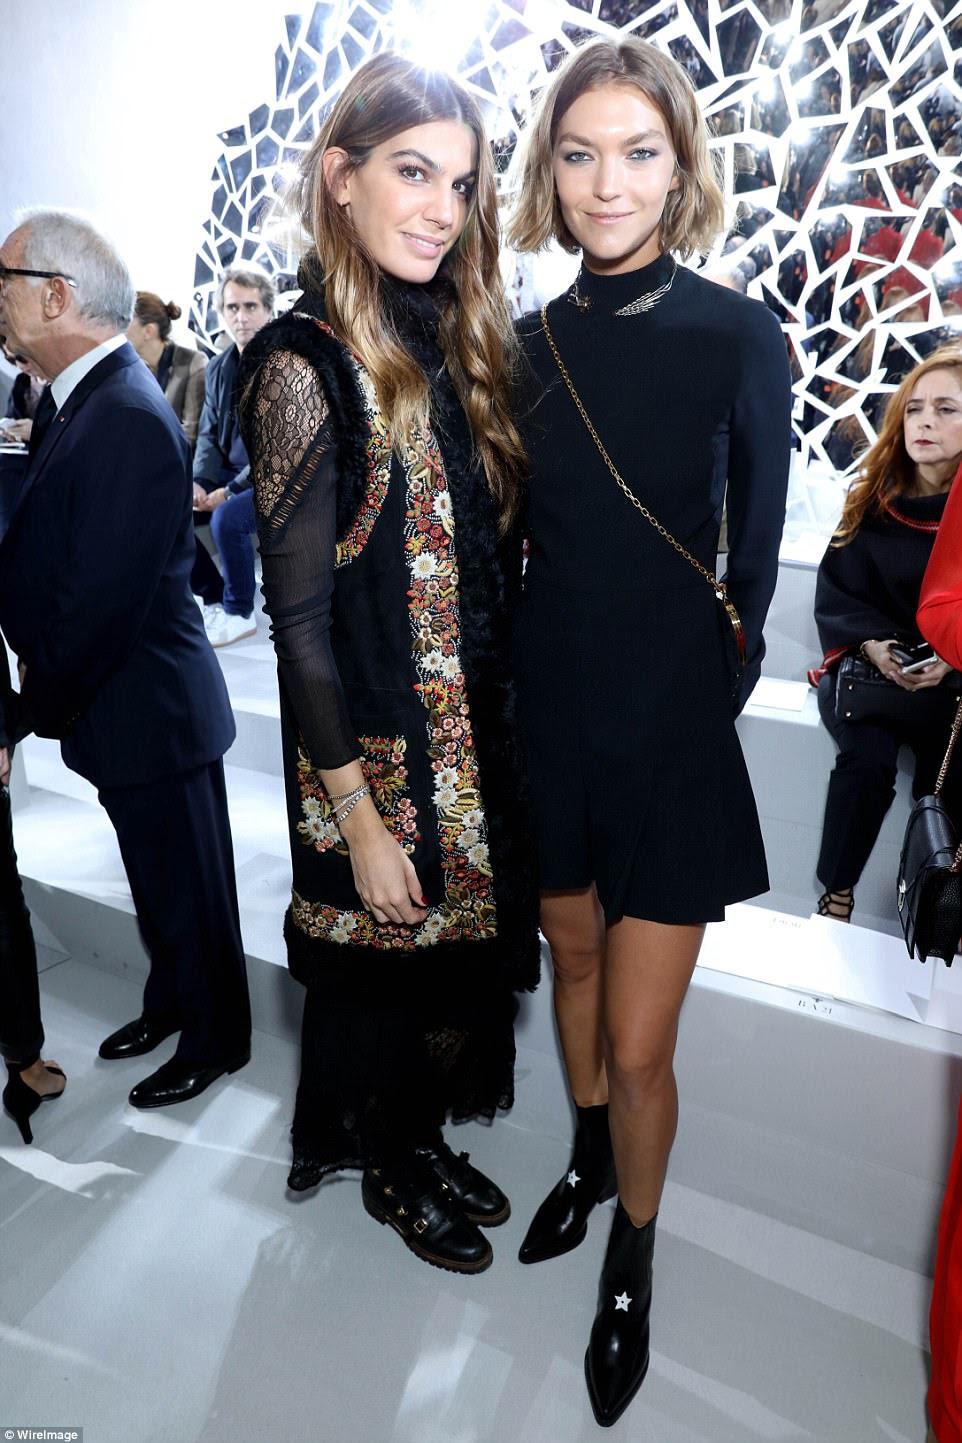 Camera ready:Bianca Brandolini d'Adda (L) and Arizona Muse posed together at the event